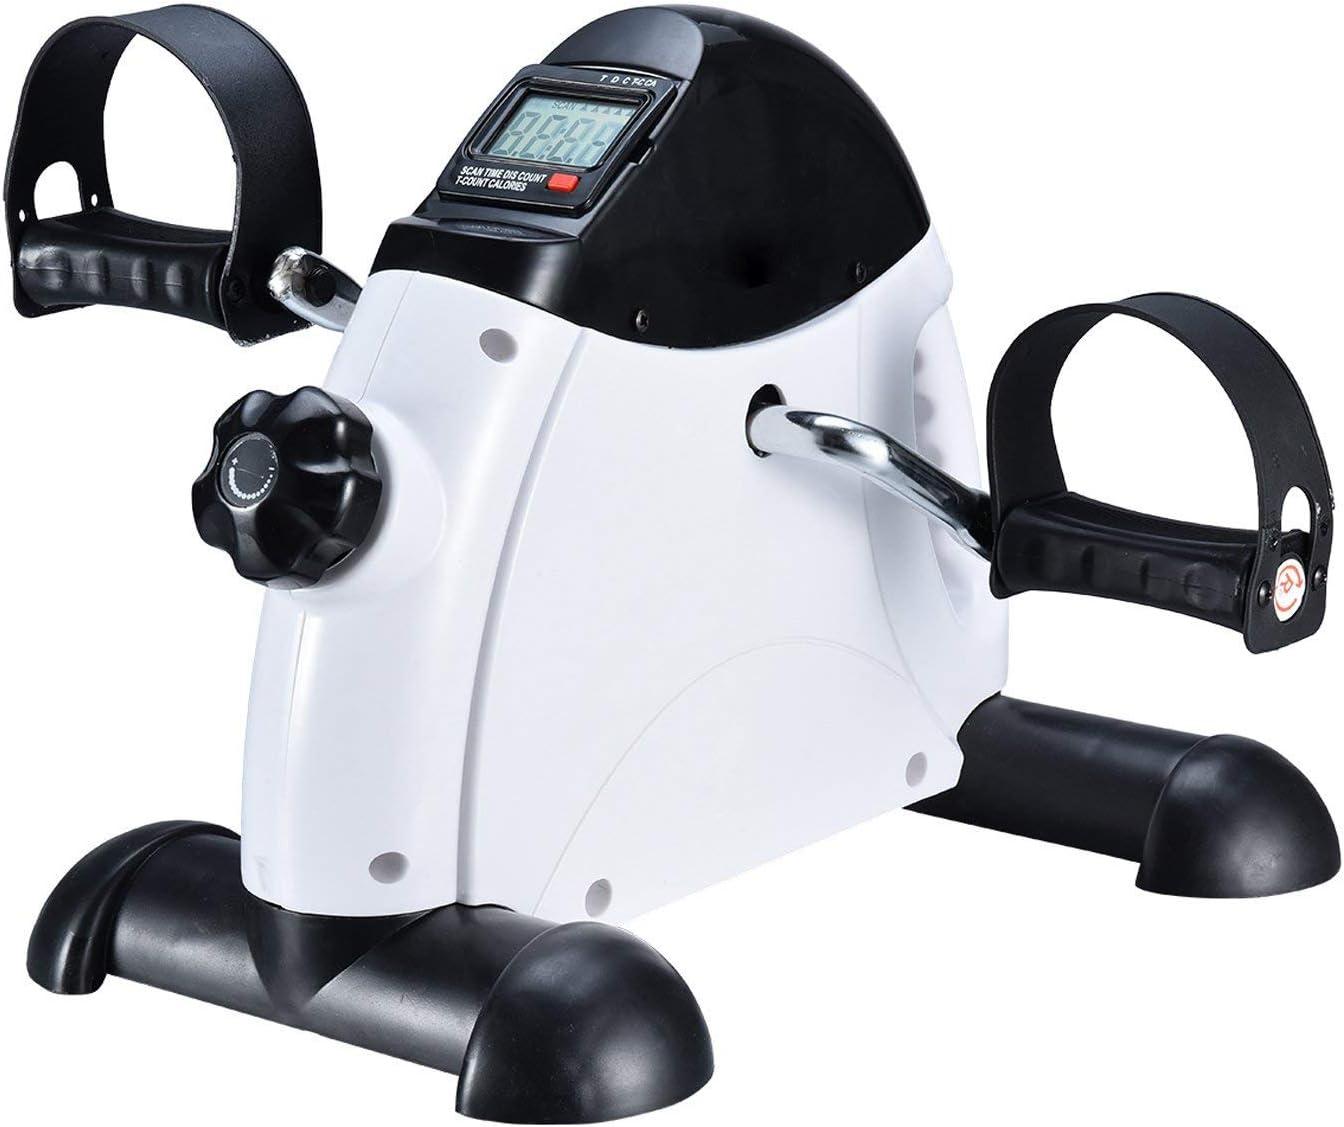 Astan Hogar Minibike con Display Ciccly AH-FT2060,: Amazon.es ...